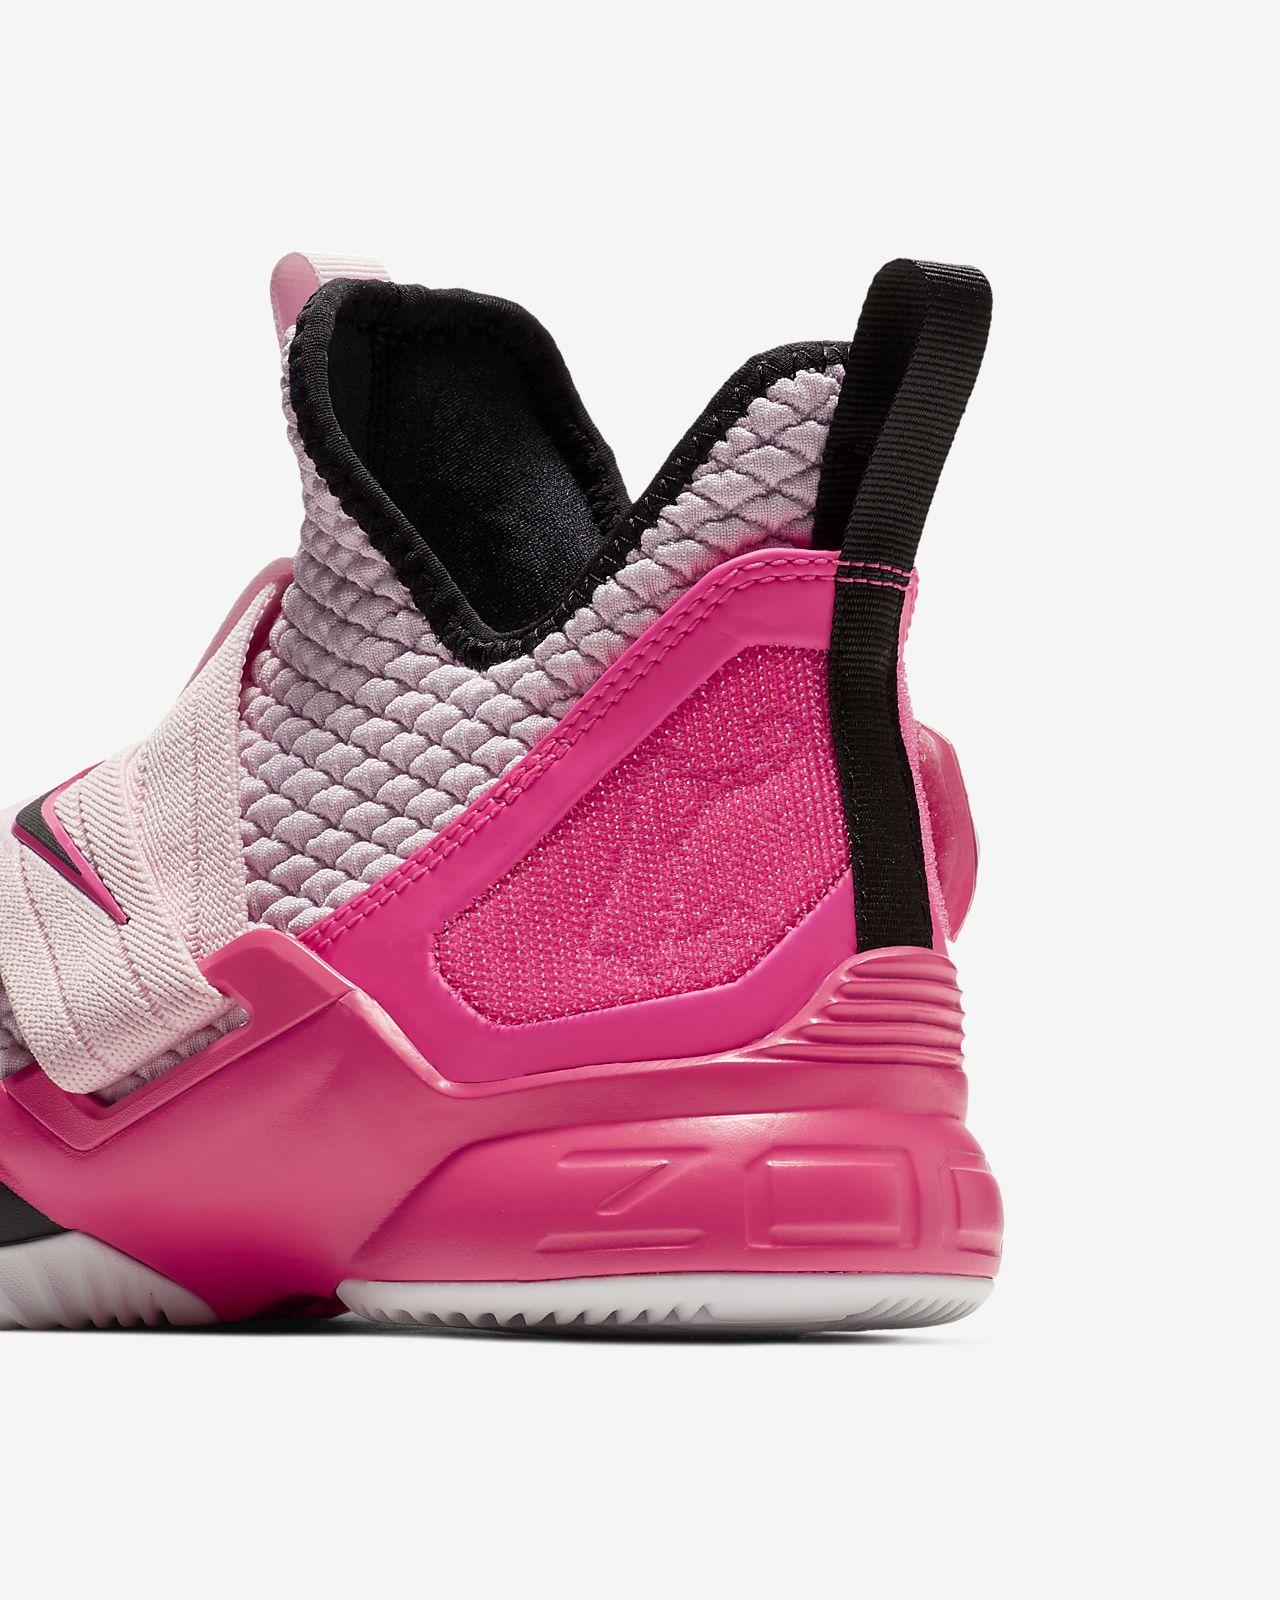 75bd645b8b3c LeBron Soldier XII Big Kids  Basketball Shoe. Nike.com